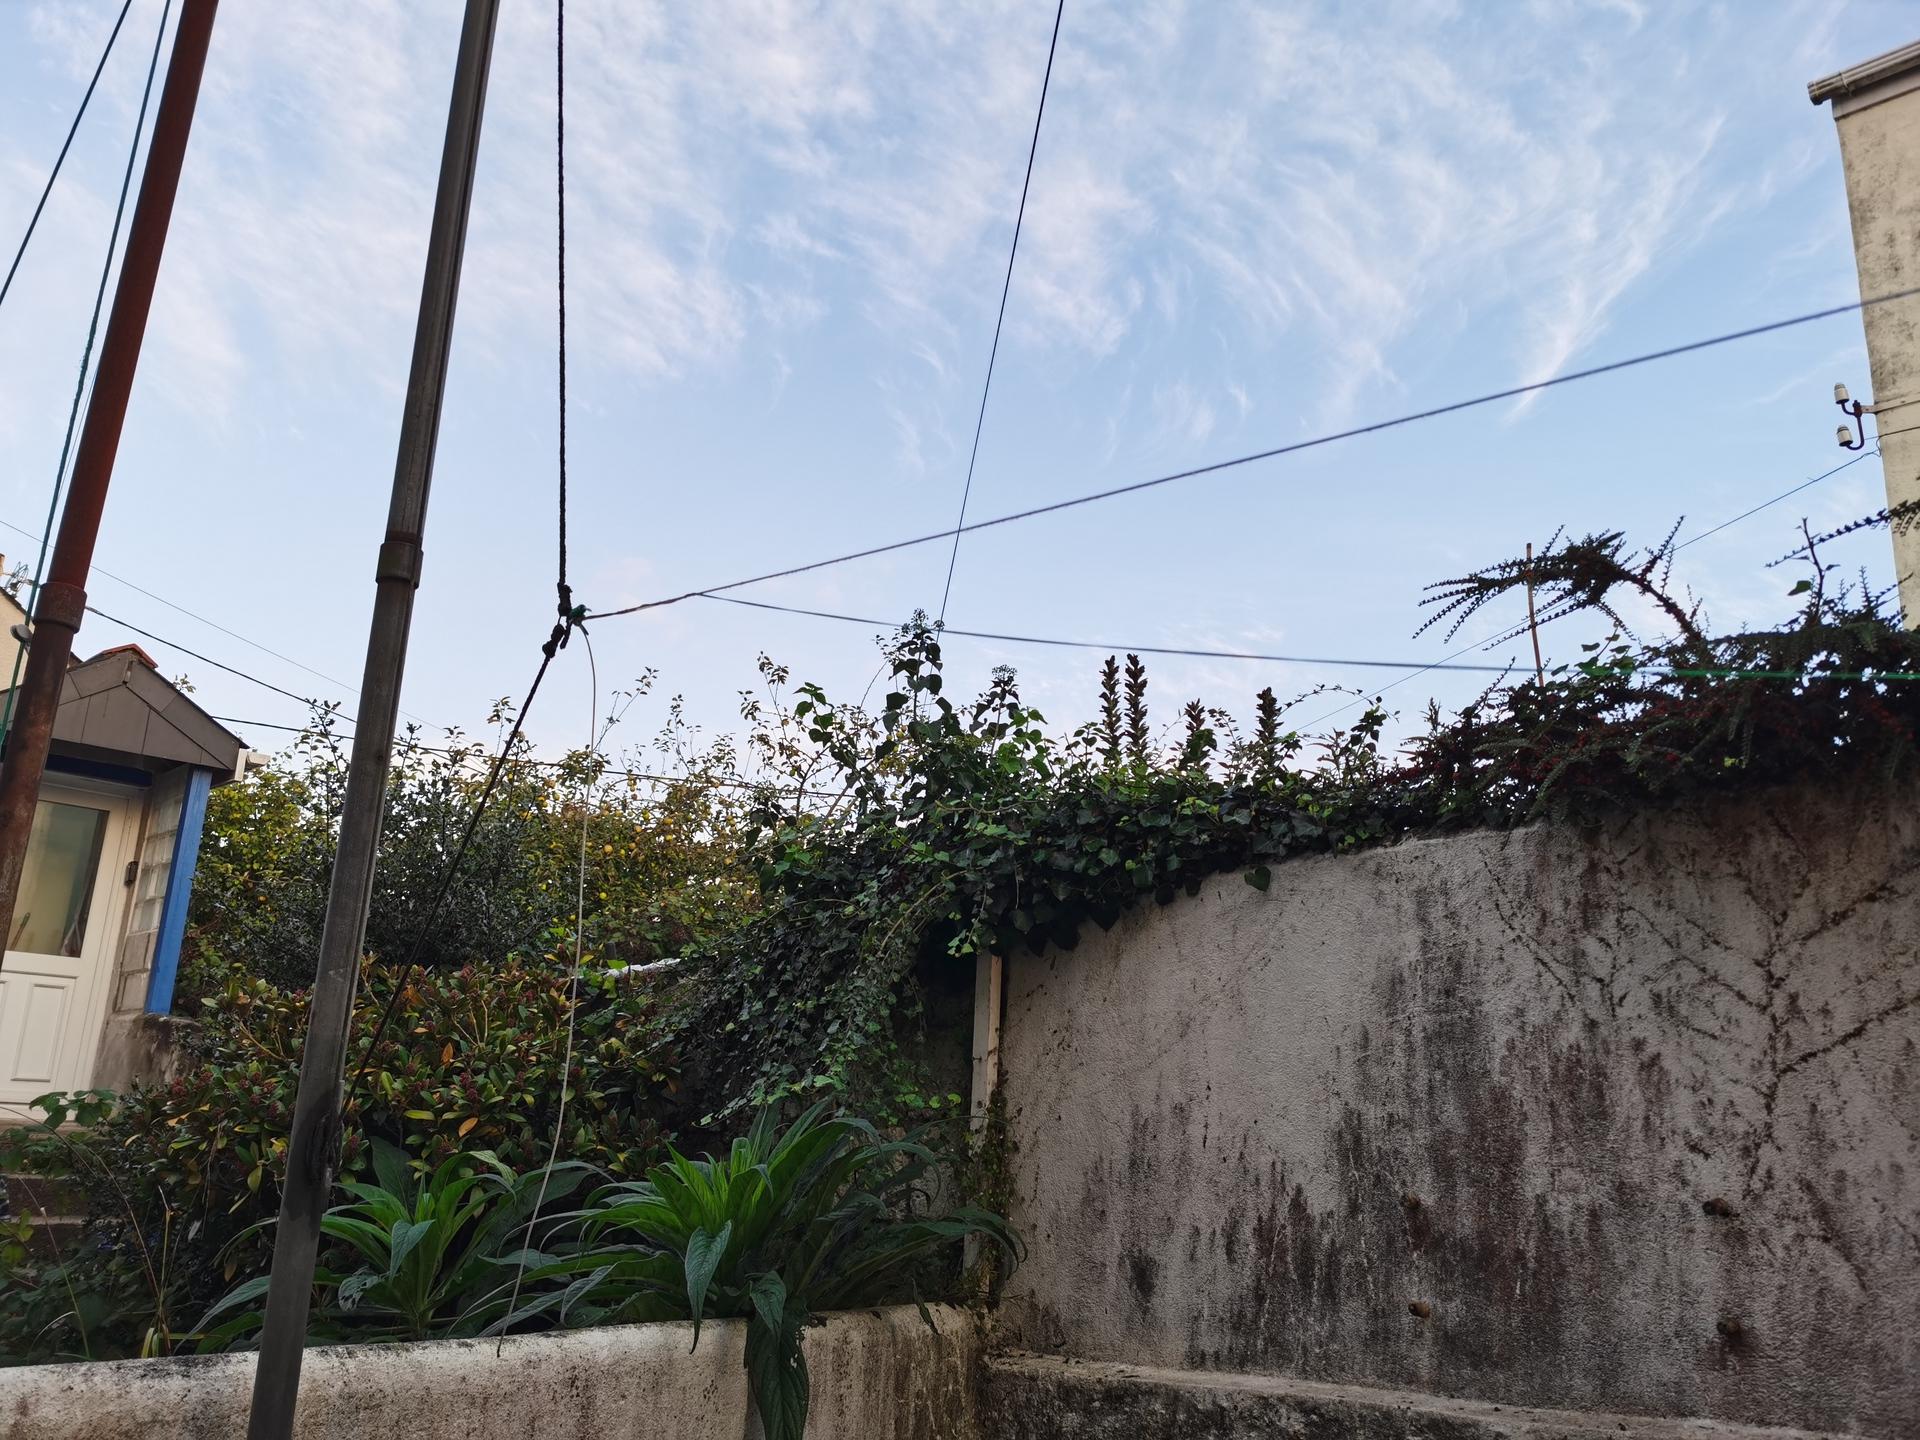 Huawei Mate 30 Pro Camera test Daylight shot of many cables